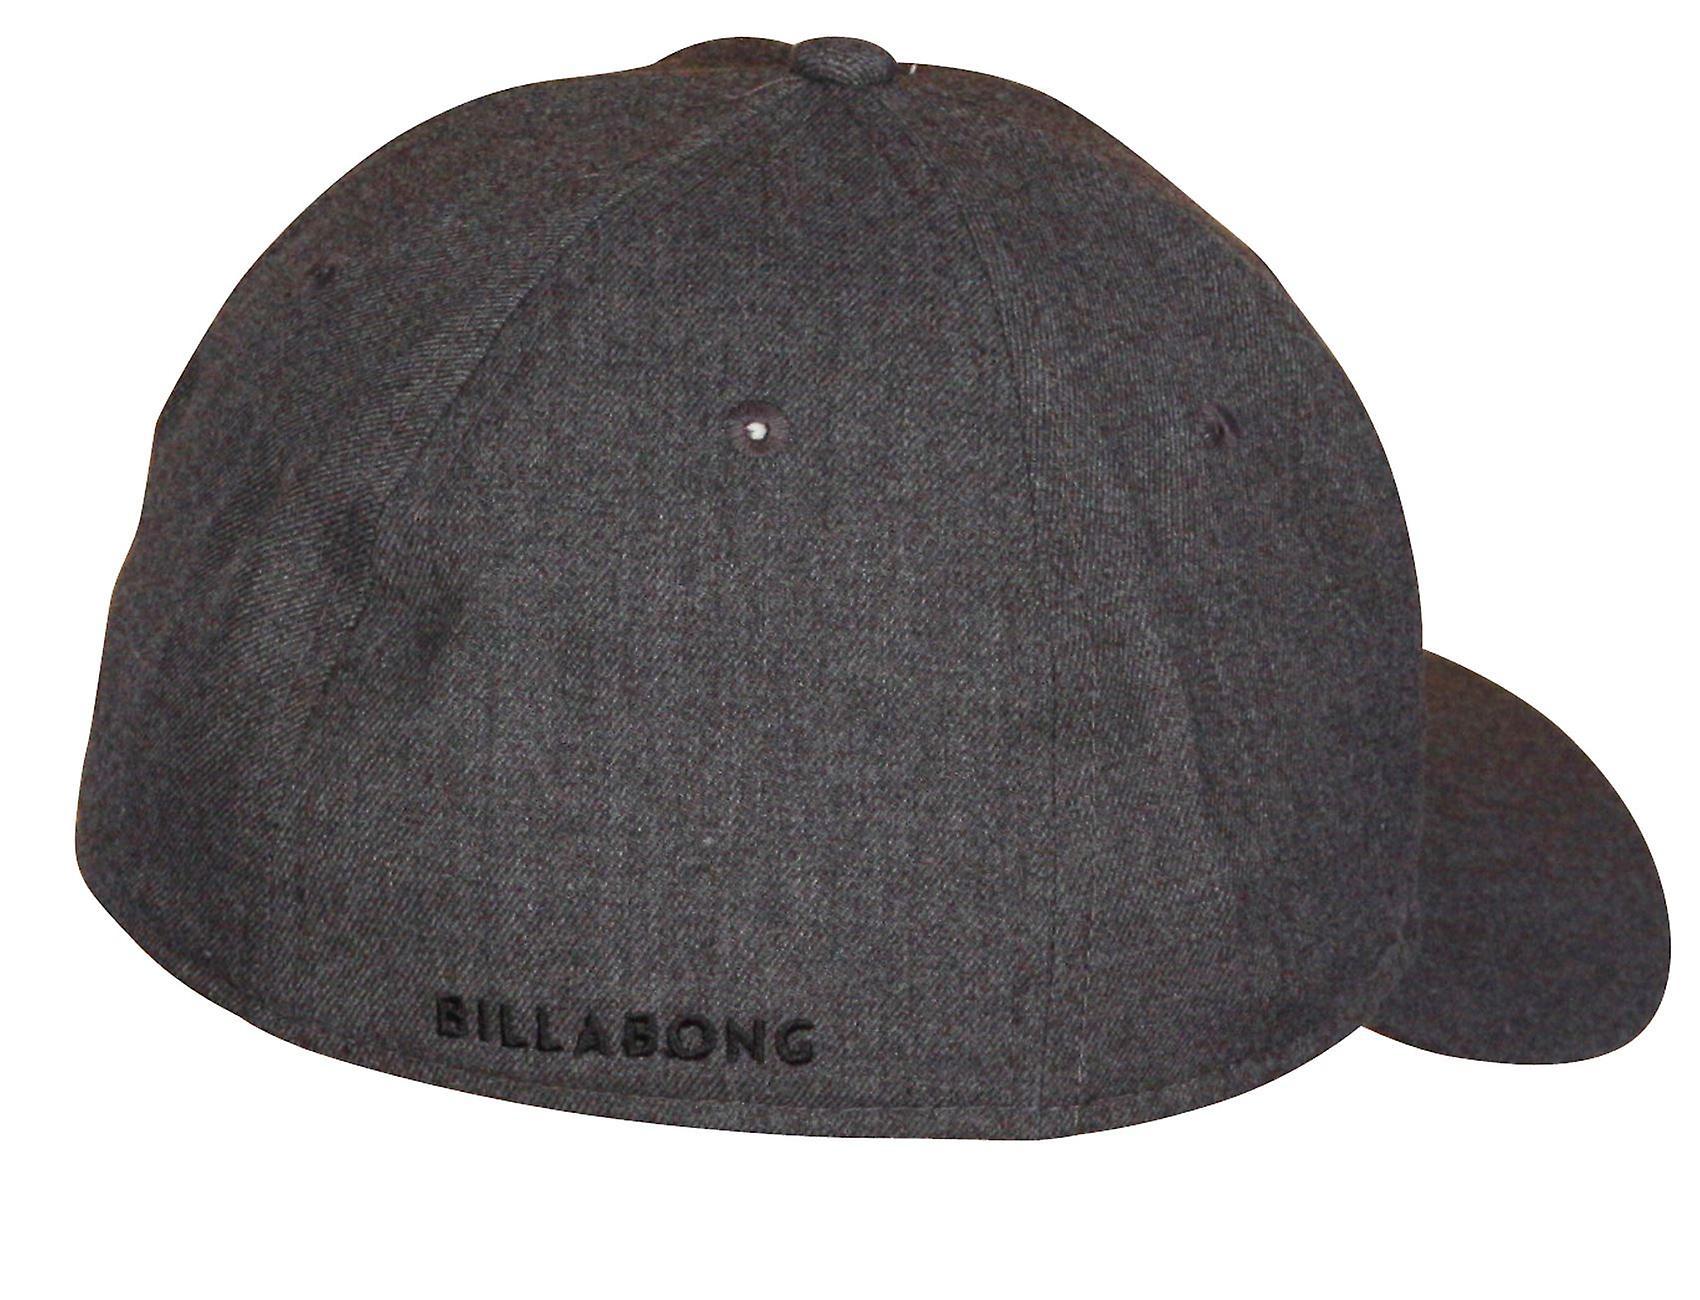 Billabong Stretch Curve Cap ~ All Day Heather grey